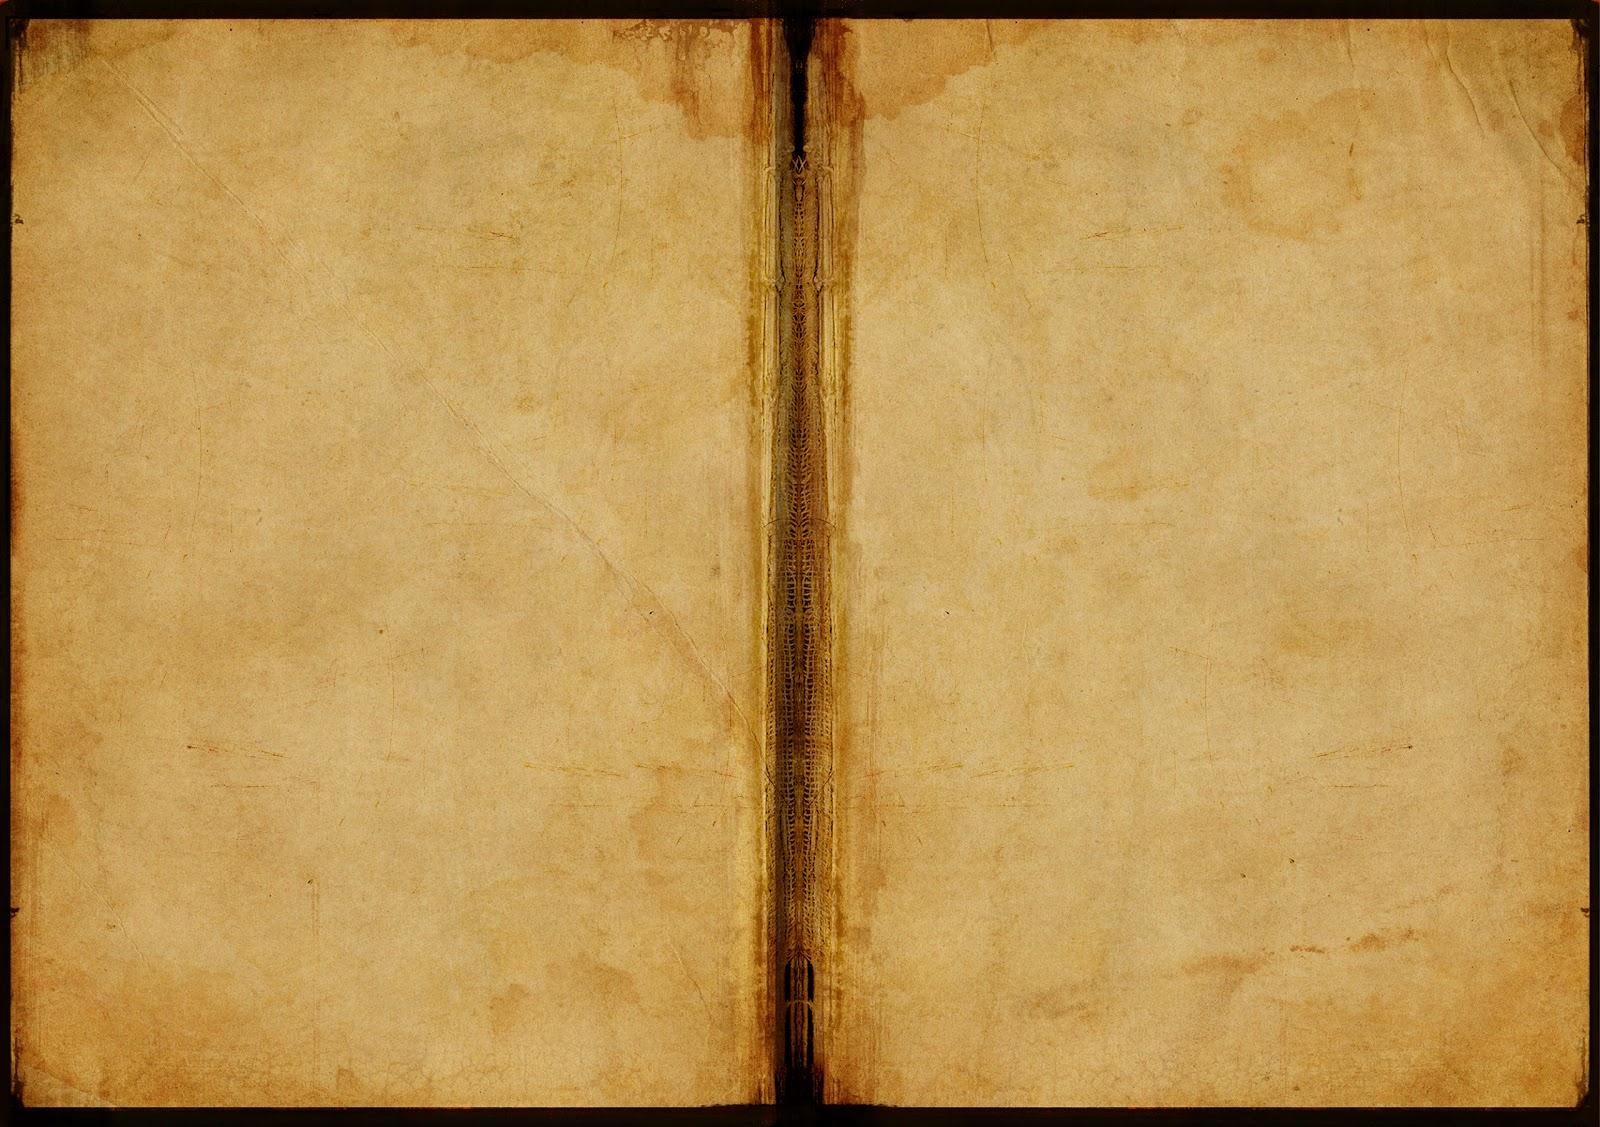 Essay on book